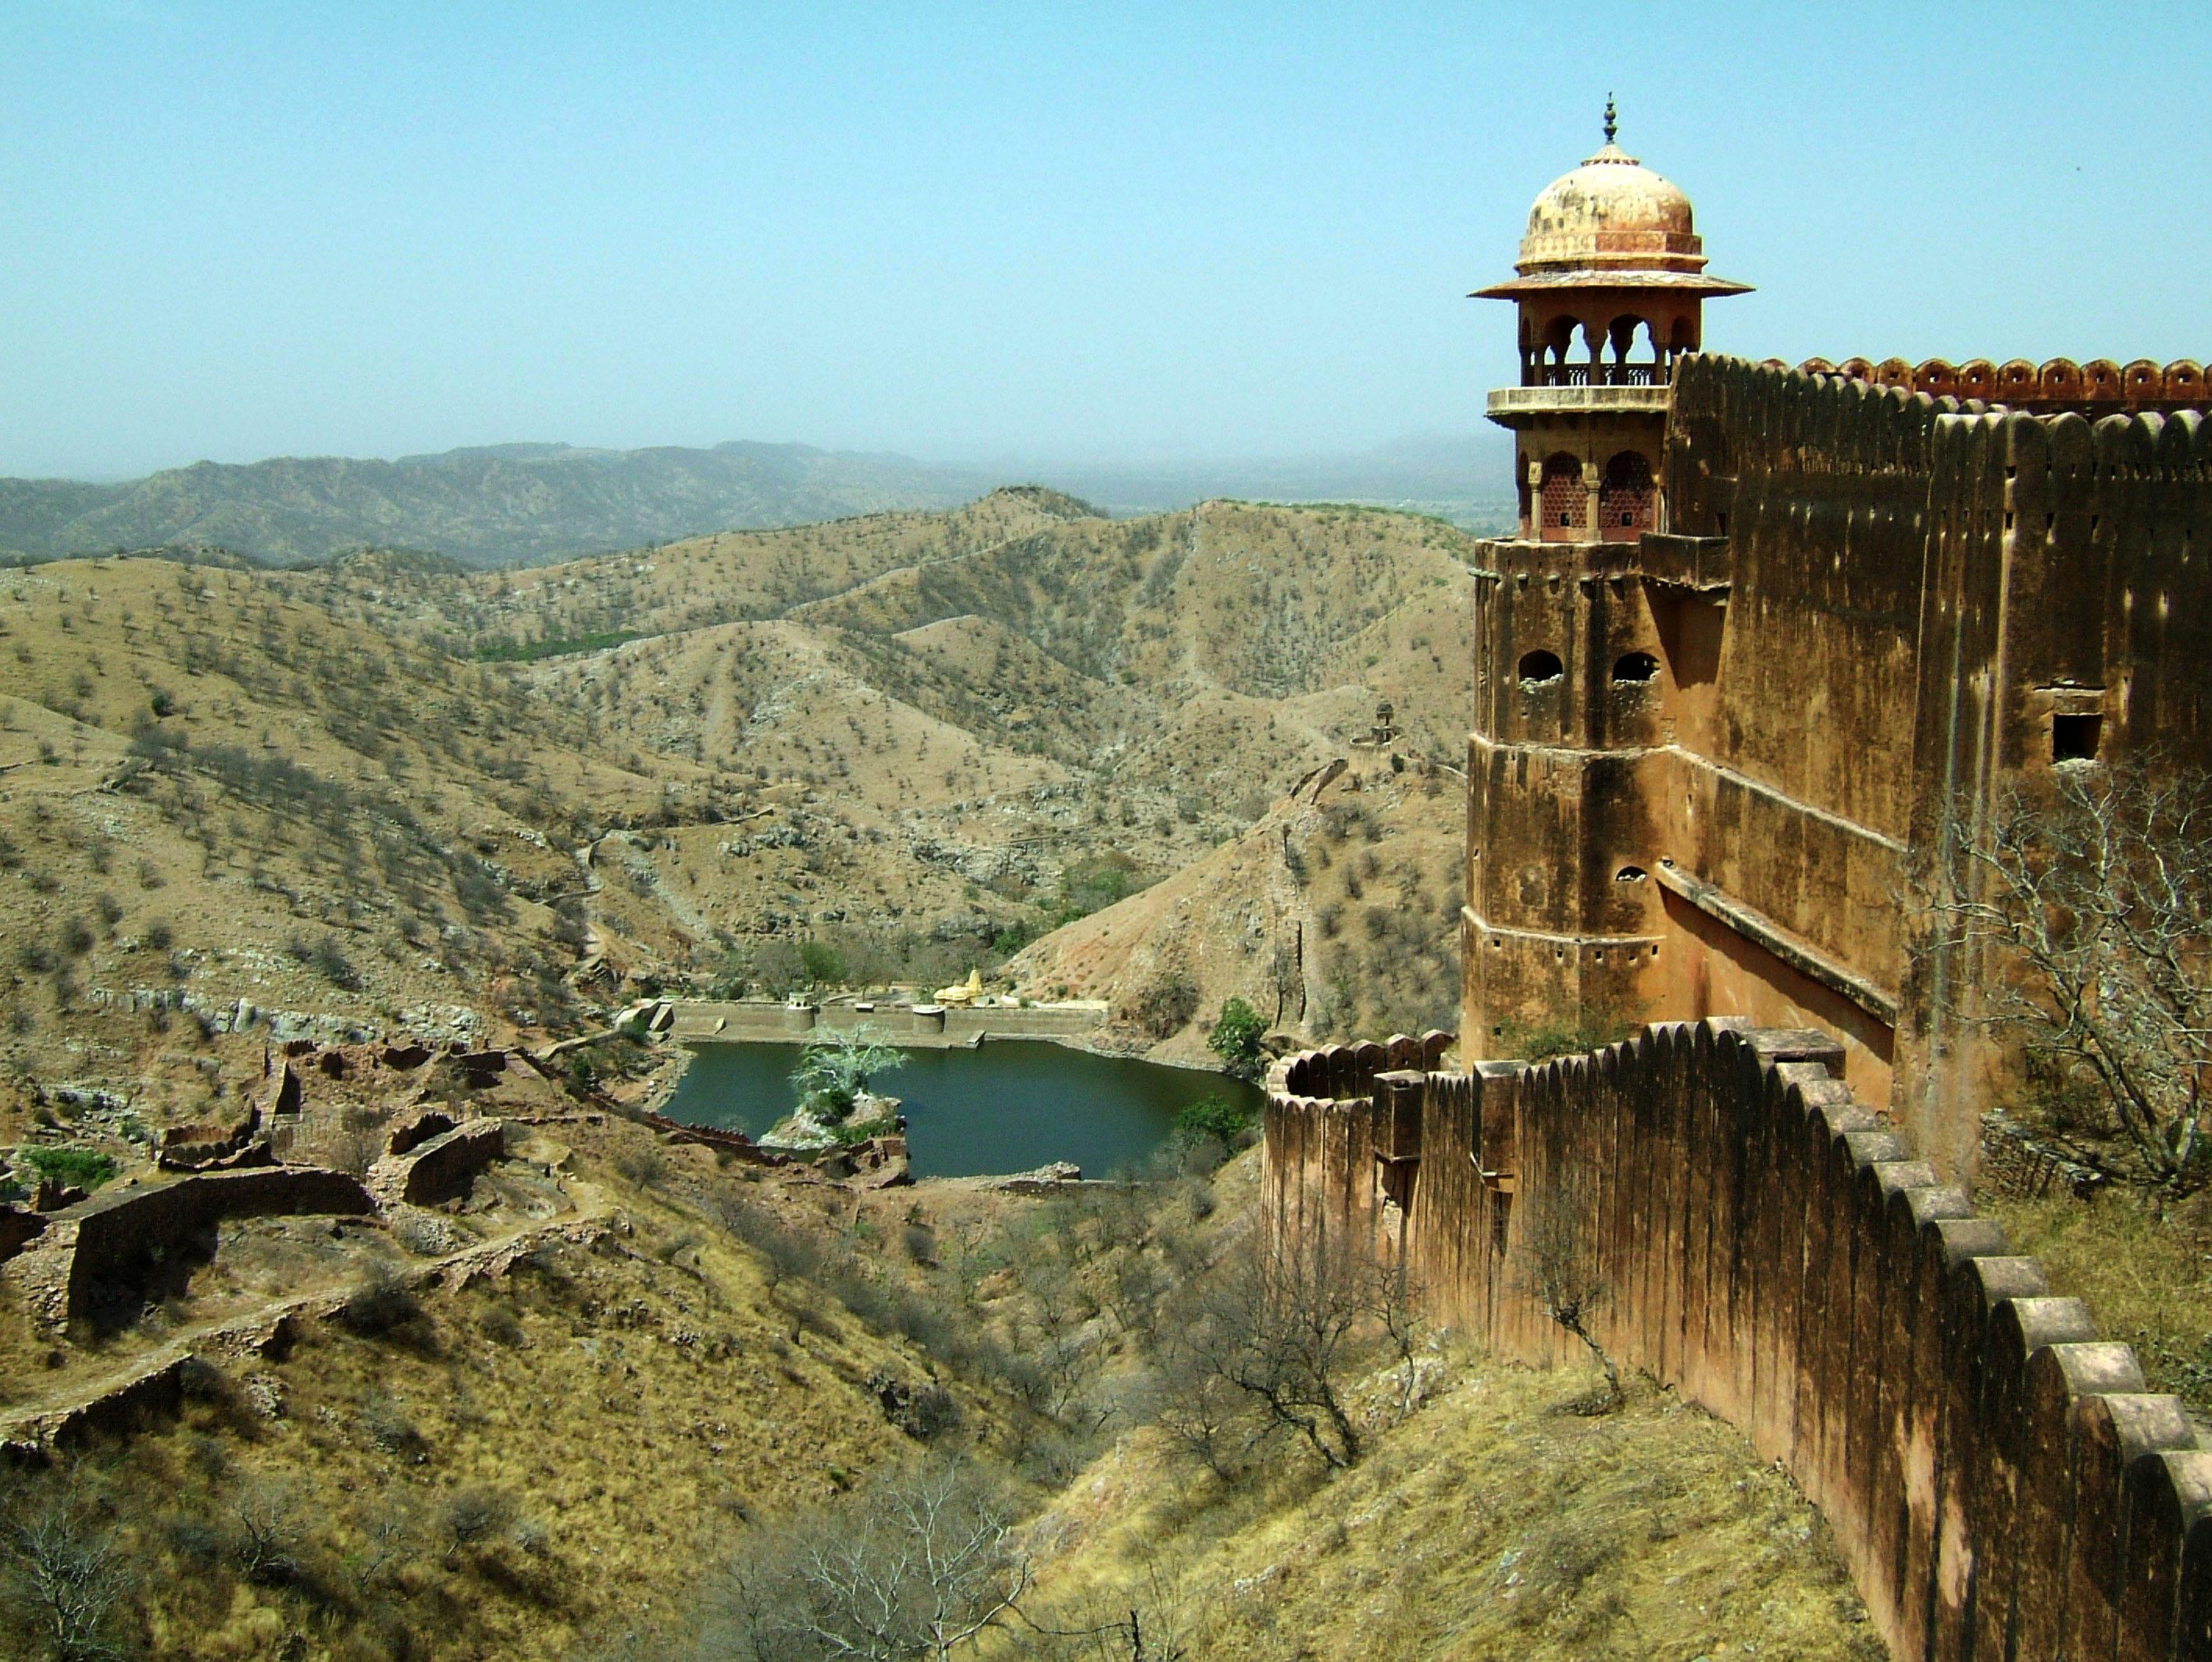 image of Jaigarh Fort